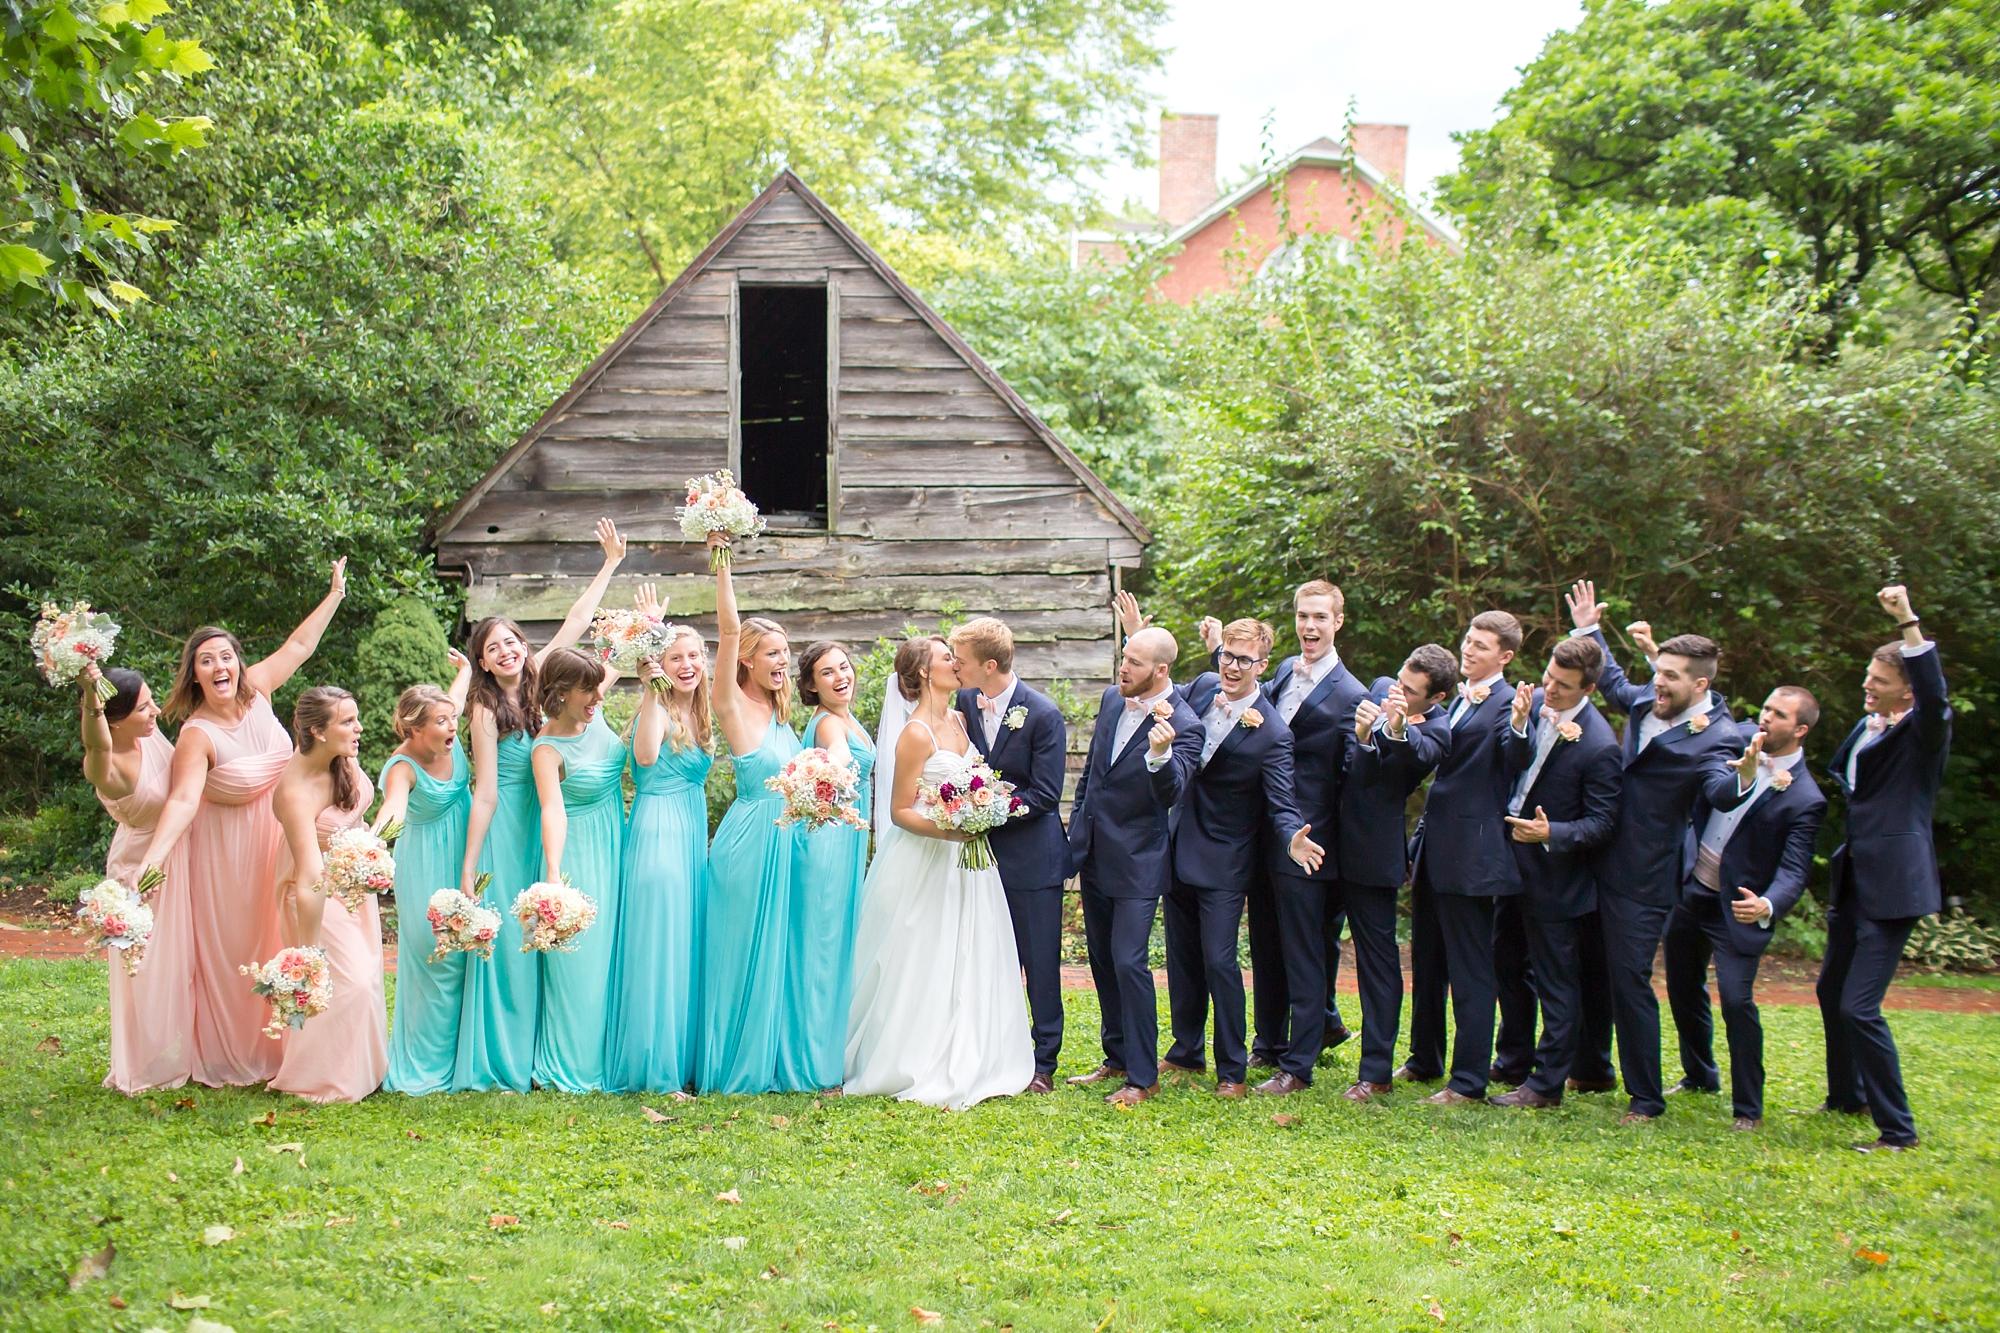 Russell 2-Bridal Party-745_anna grace photography baltimore maryland wedding photographer elkridge furnace inn wedding photo.jpg